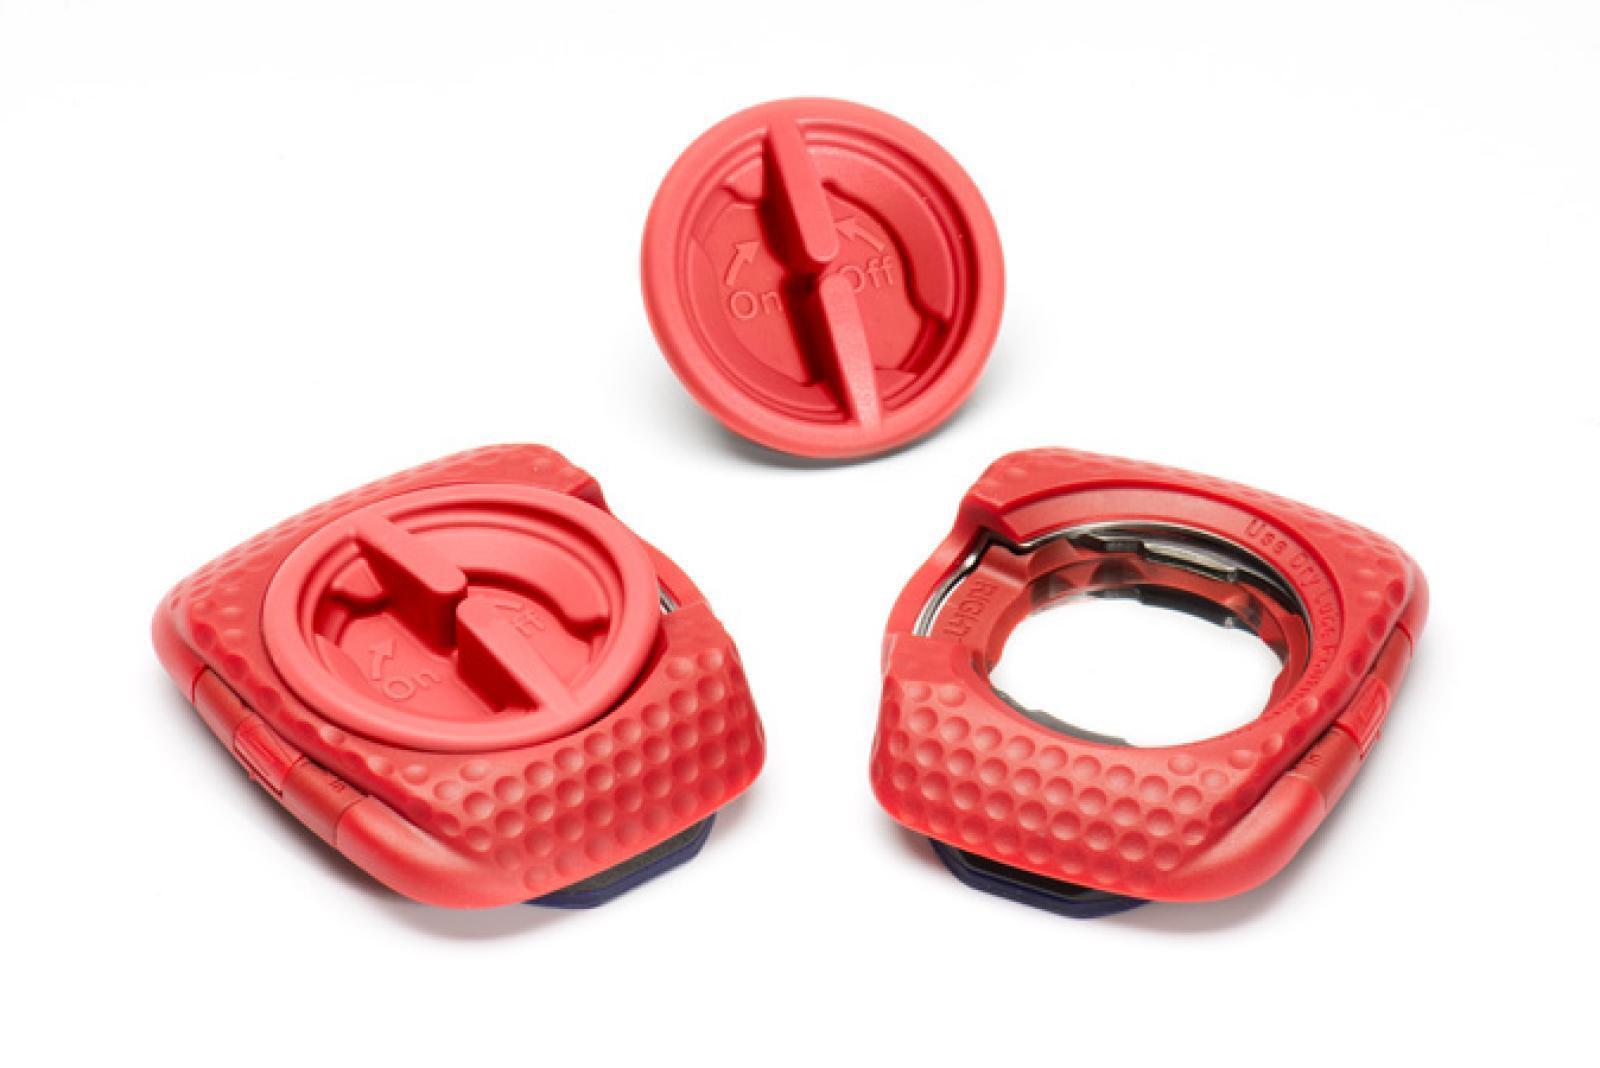 Speedplay Zero Pave Walkable Pedalplader, red | Pedaler